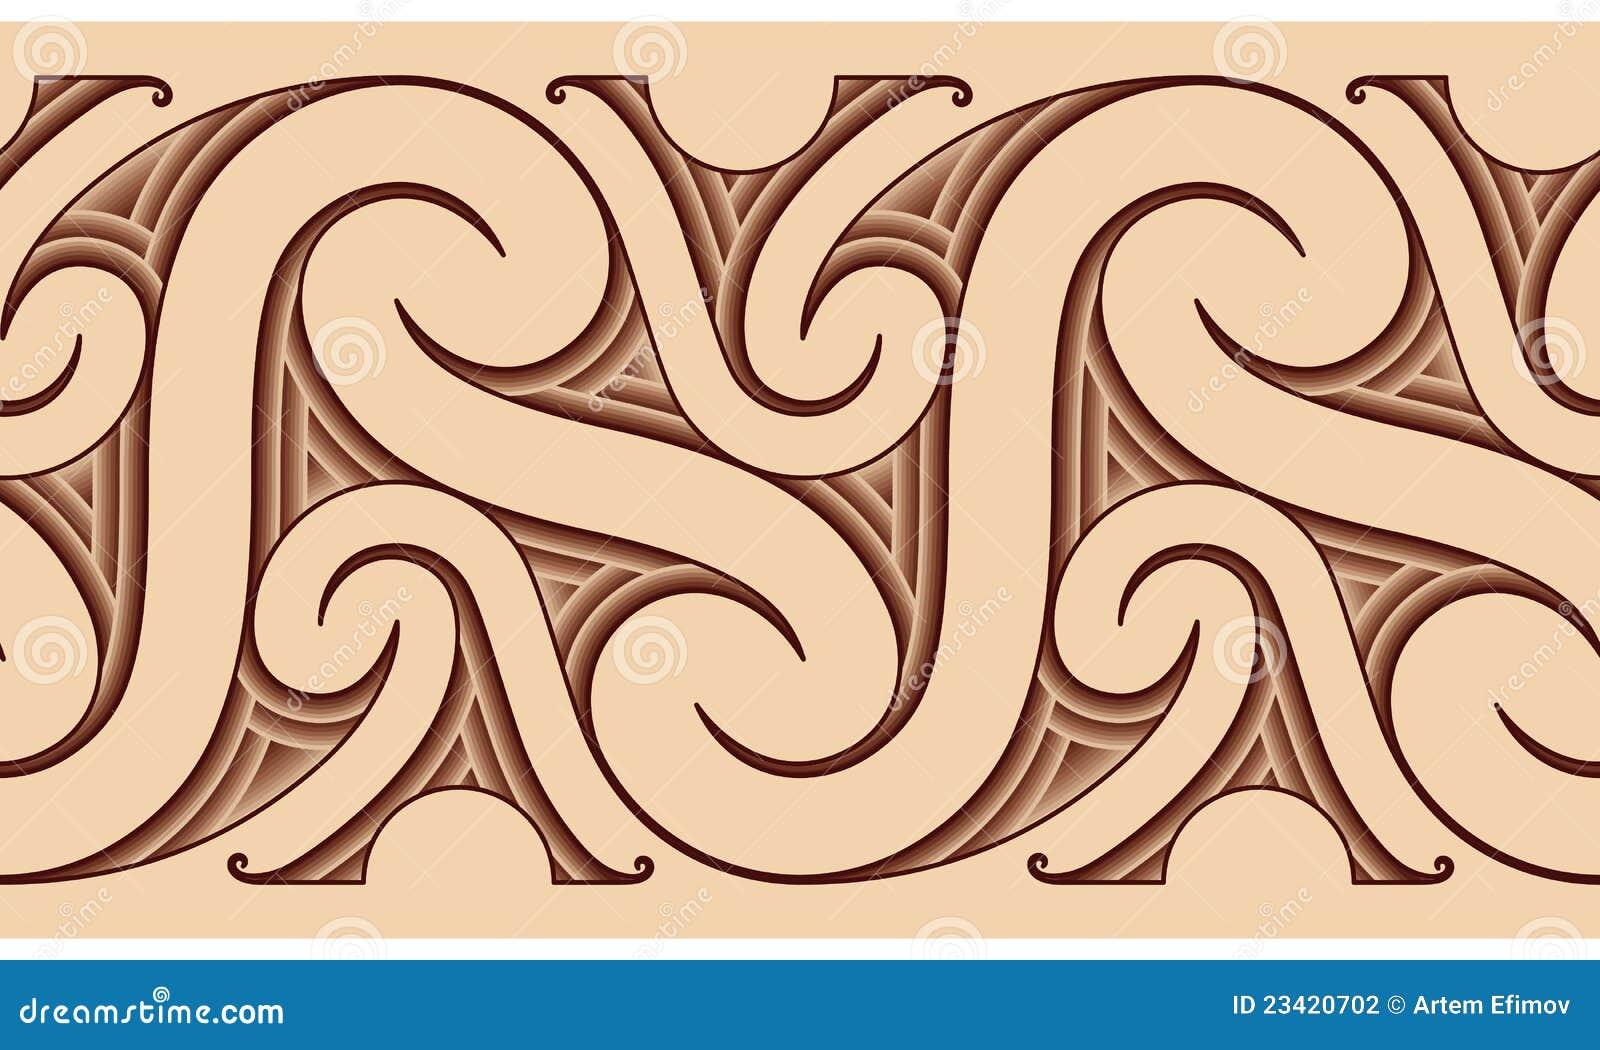 Maori Designs Wave Wwwgalleryhipcom The Hippest Pics